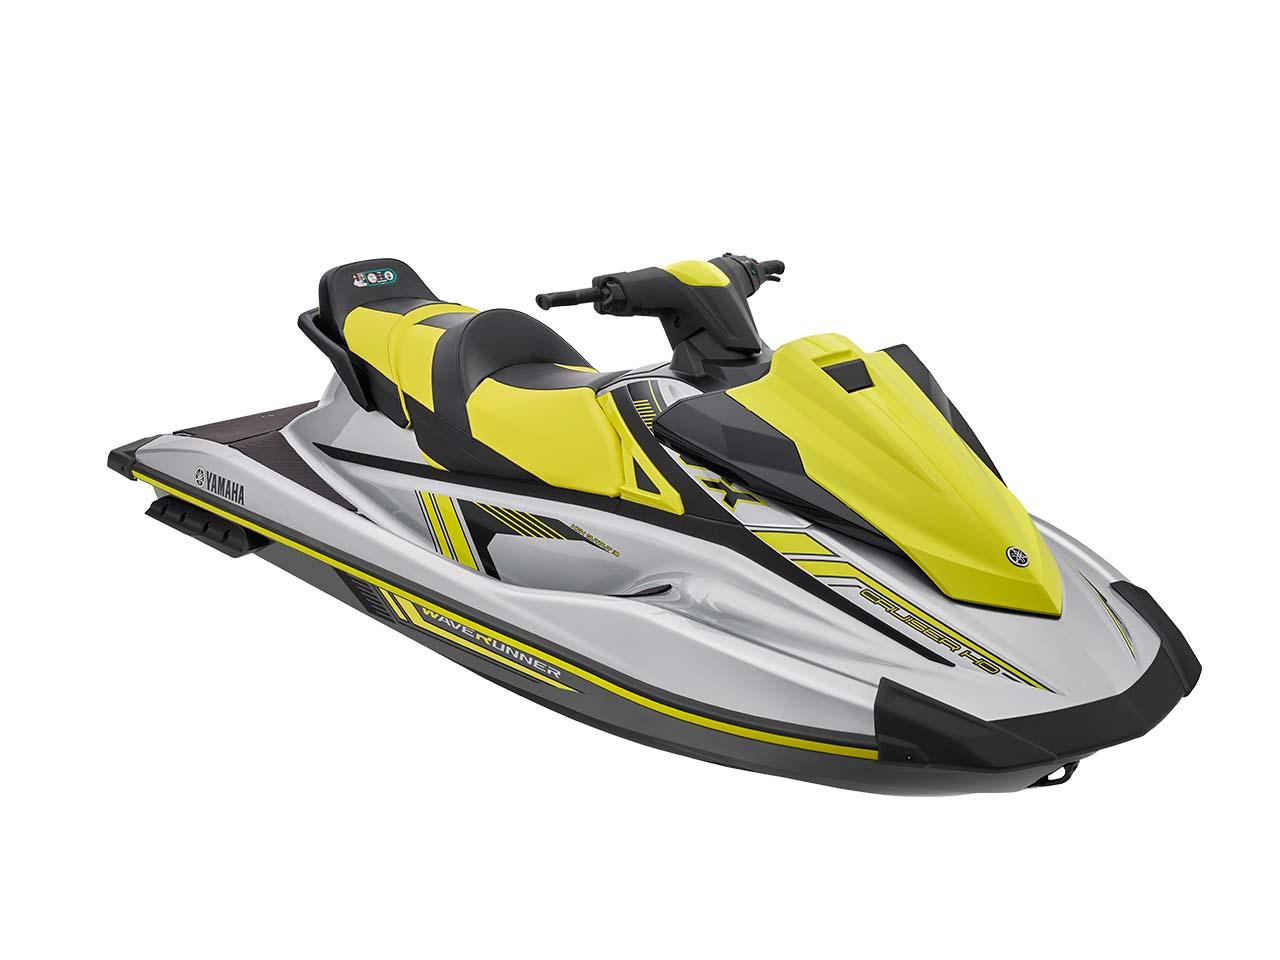 VX Cruiser HO yamaha - boat shopping